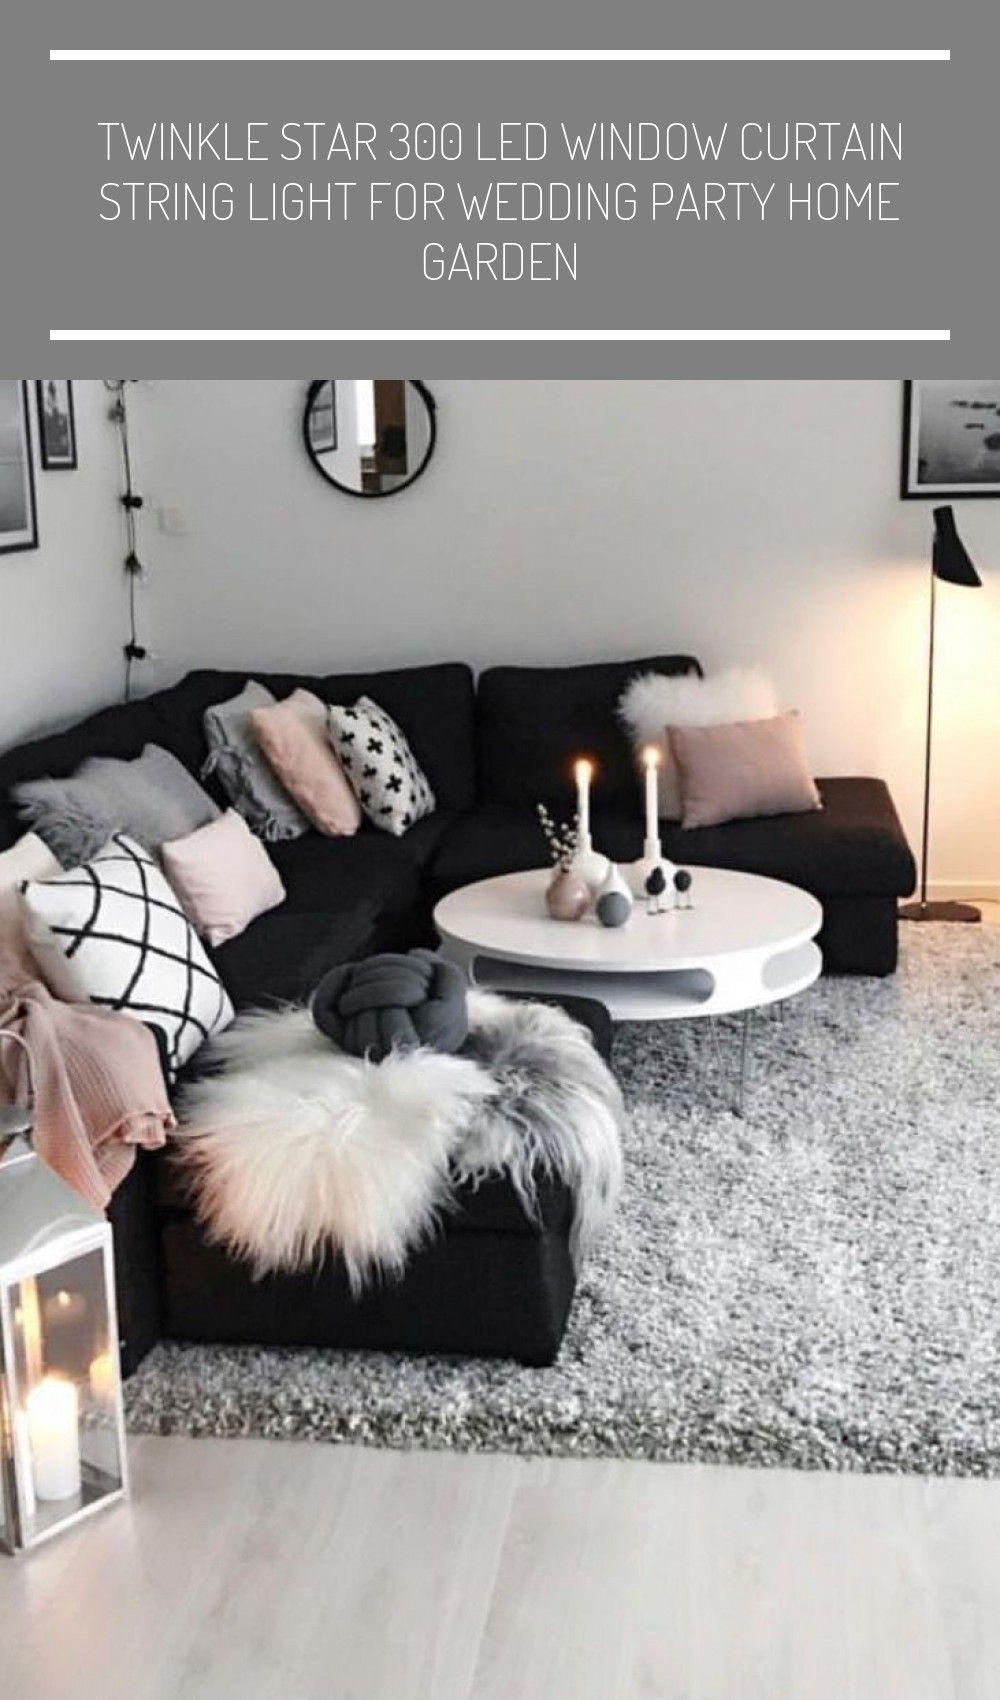 Cozy And Modern Black White Grey Pink Living Room Dorm Room Organization Pink In 2020 Black Living Room Black Living Room Decor Black And White Living Room